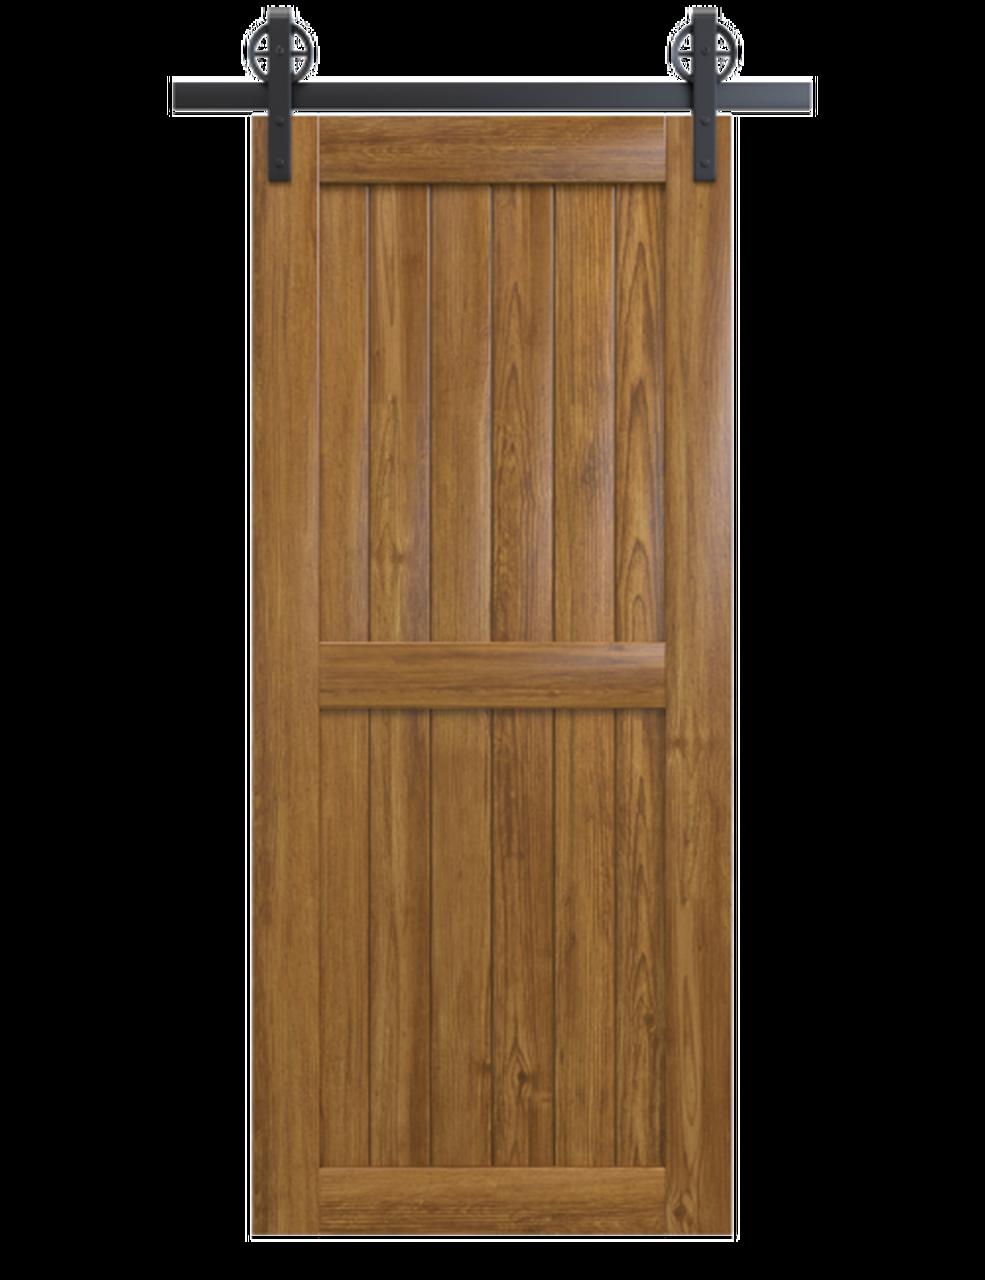 naples light stained wood 2 panel barn door